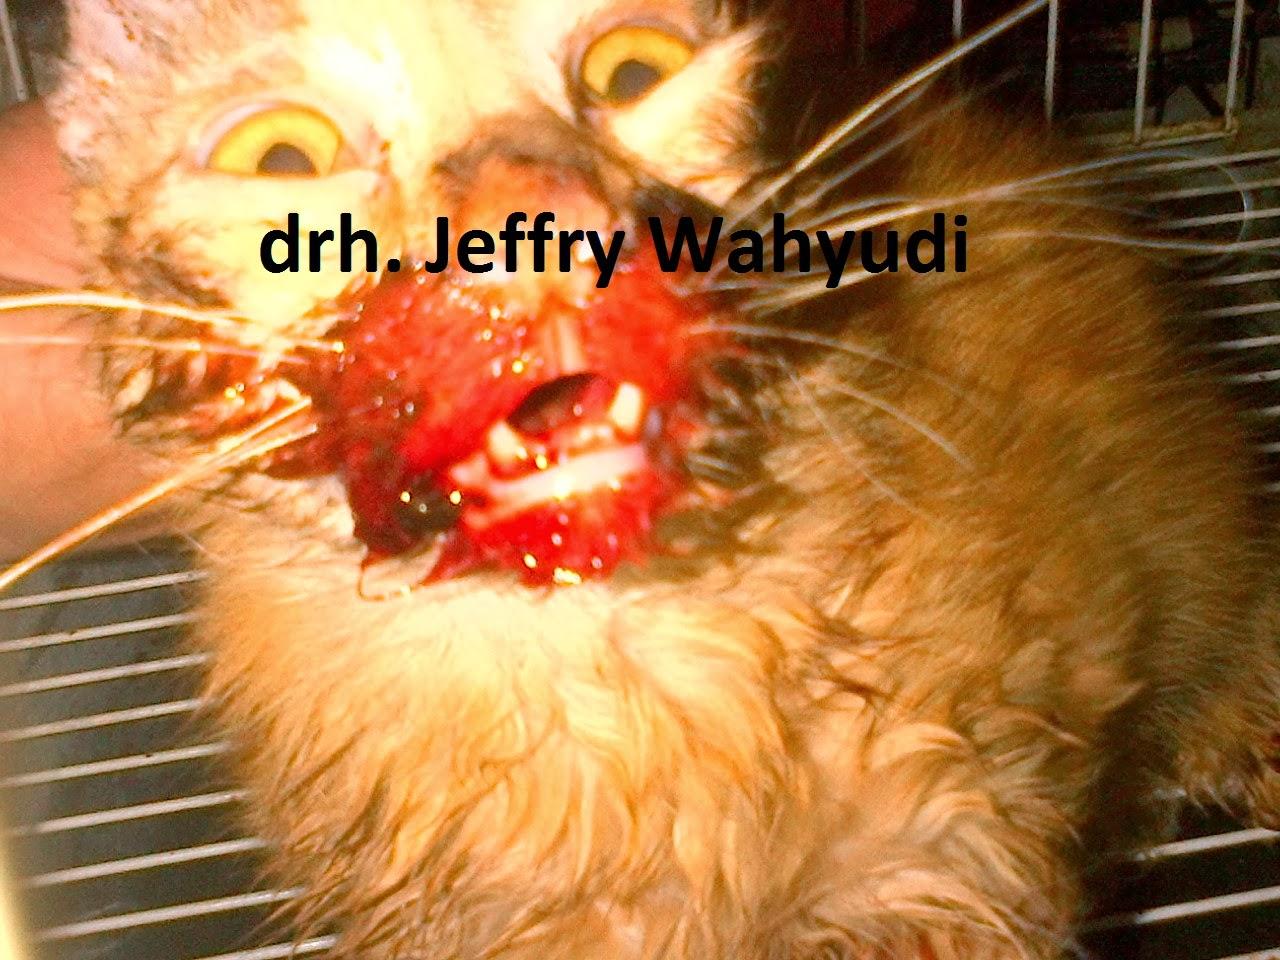 PAWS &CLAWS VET CLINIC: Feline panleukopenia